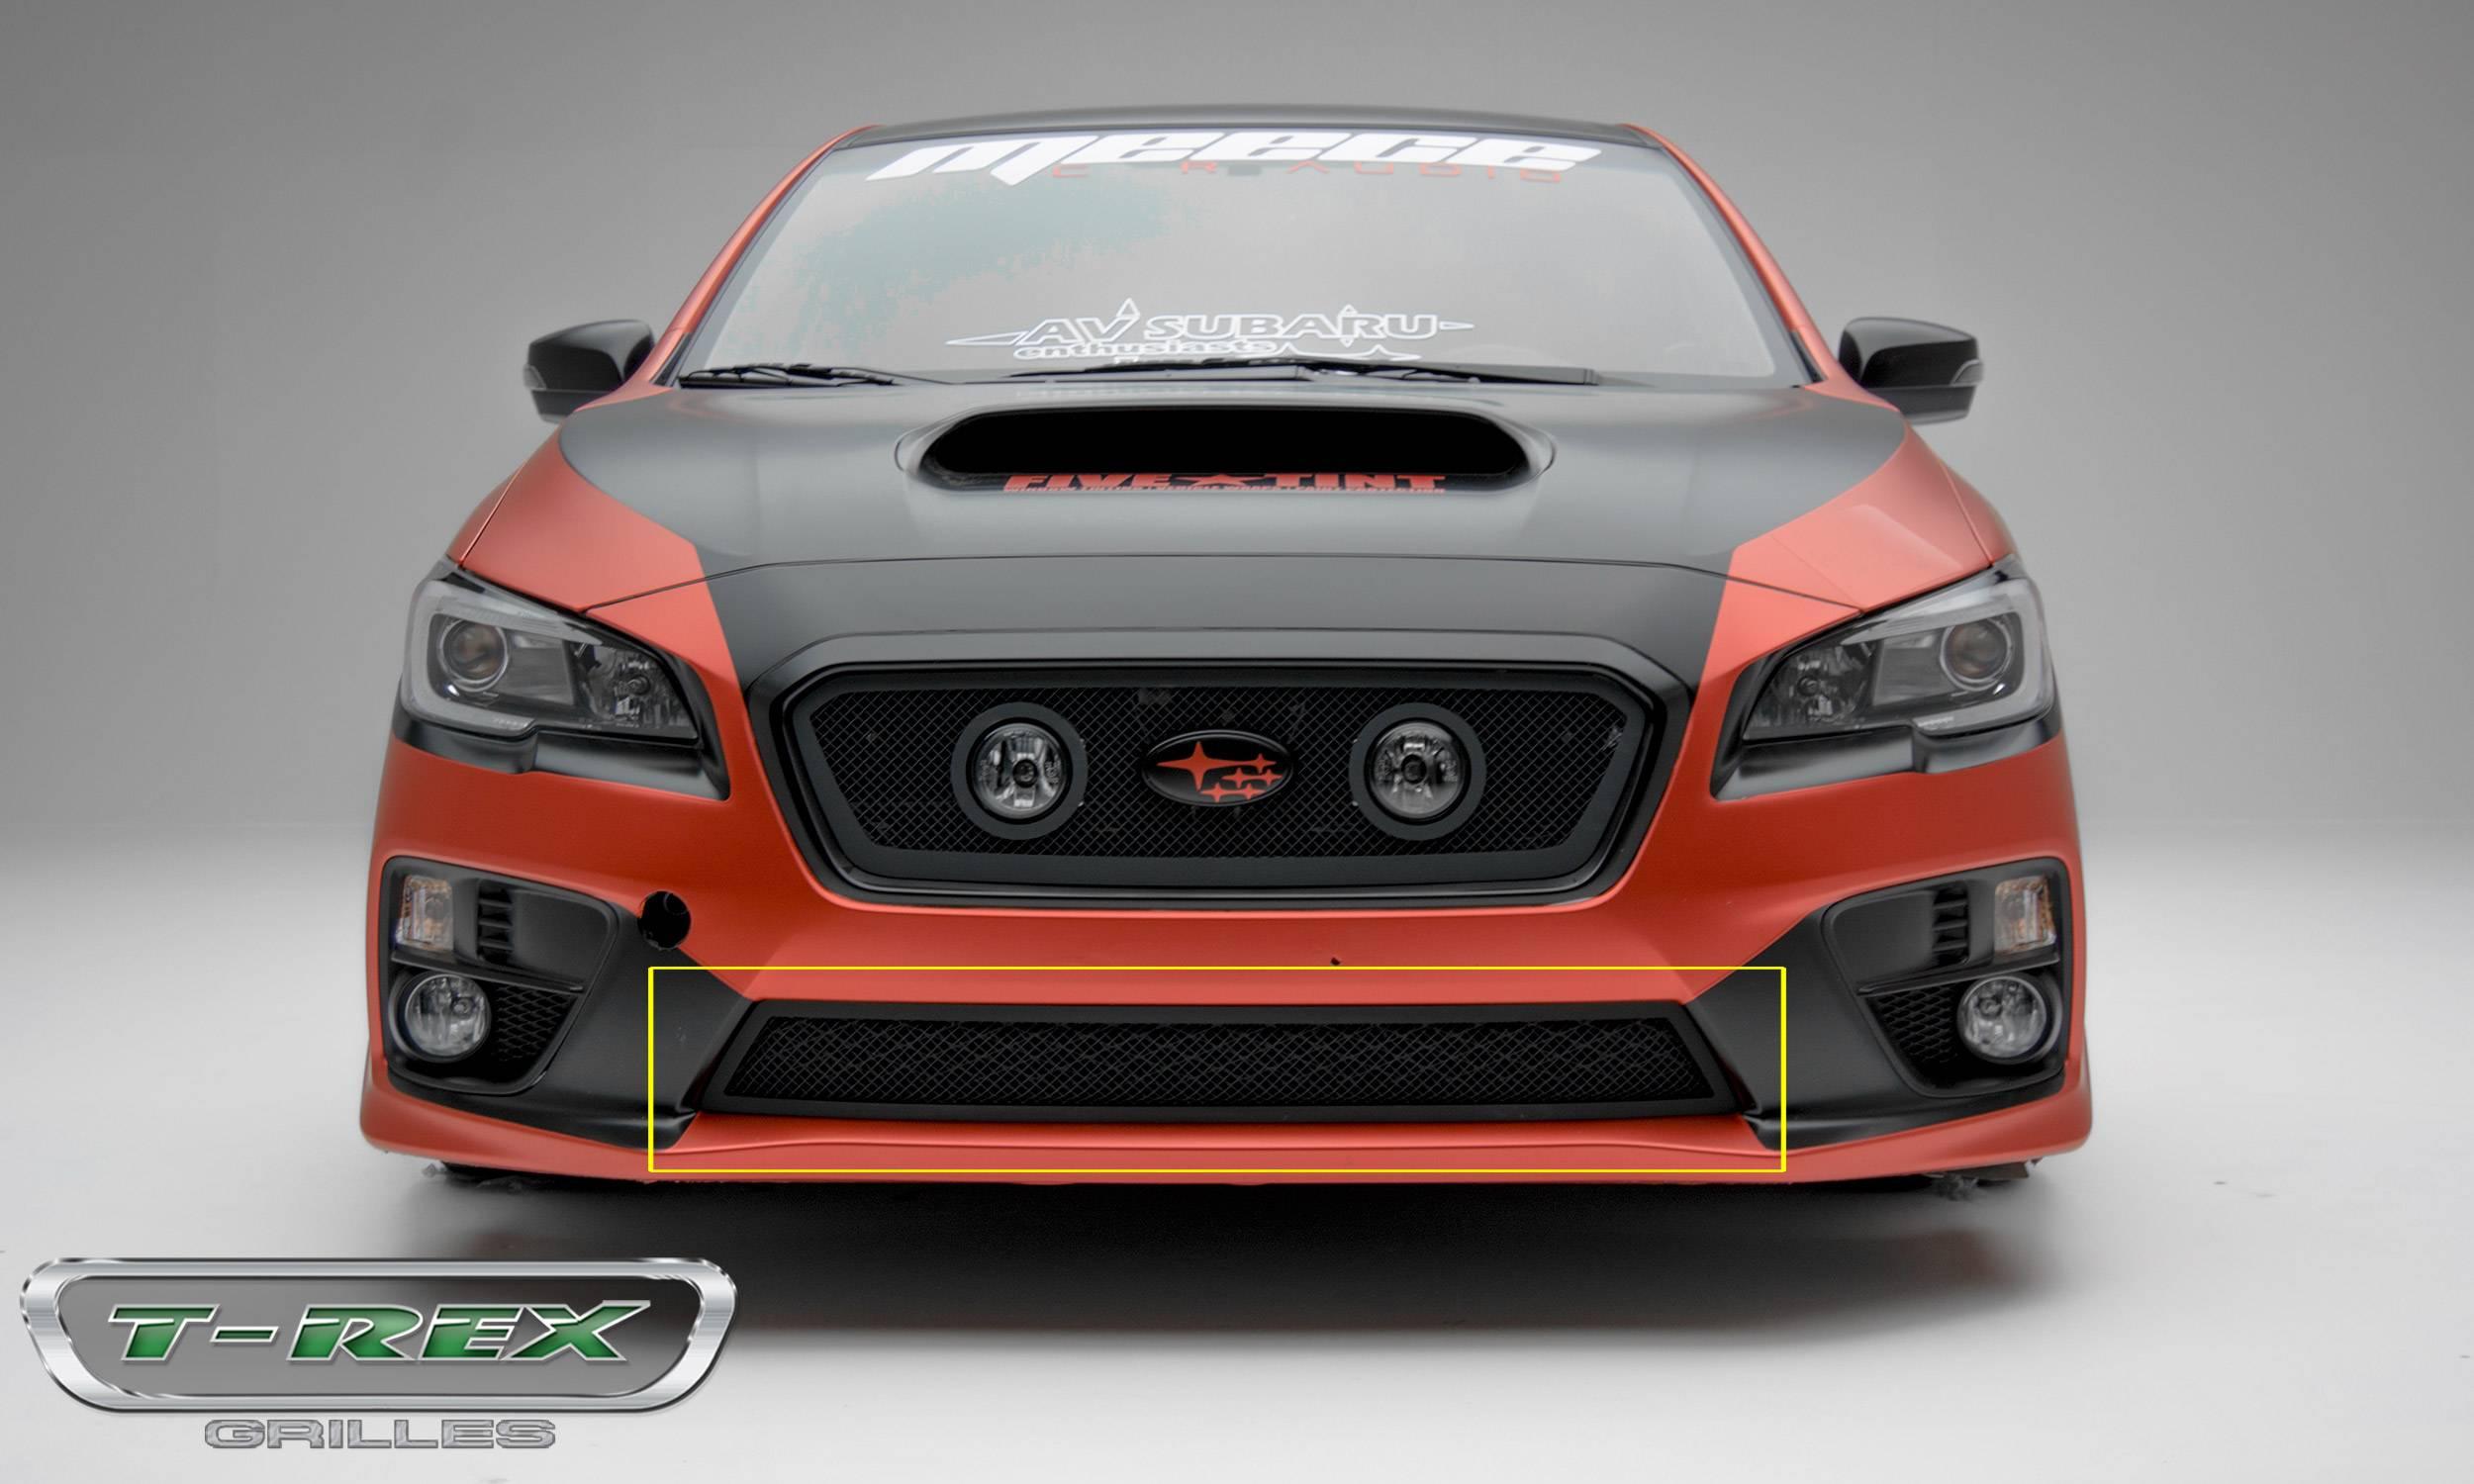 T-REX Grilles - Subaru Impreza WRX - Upper Class - Bumper Grille - Black Mesh Overlay - Part# 52982